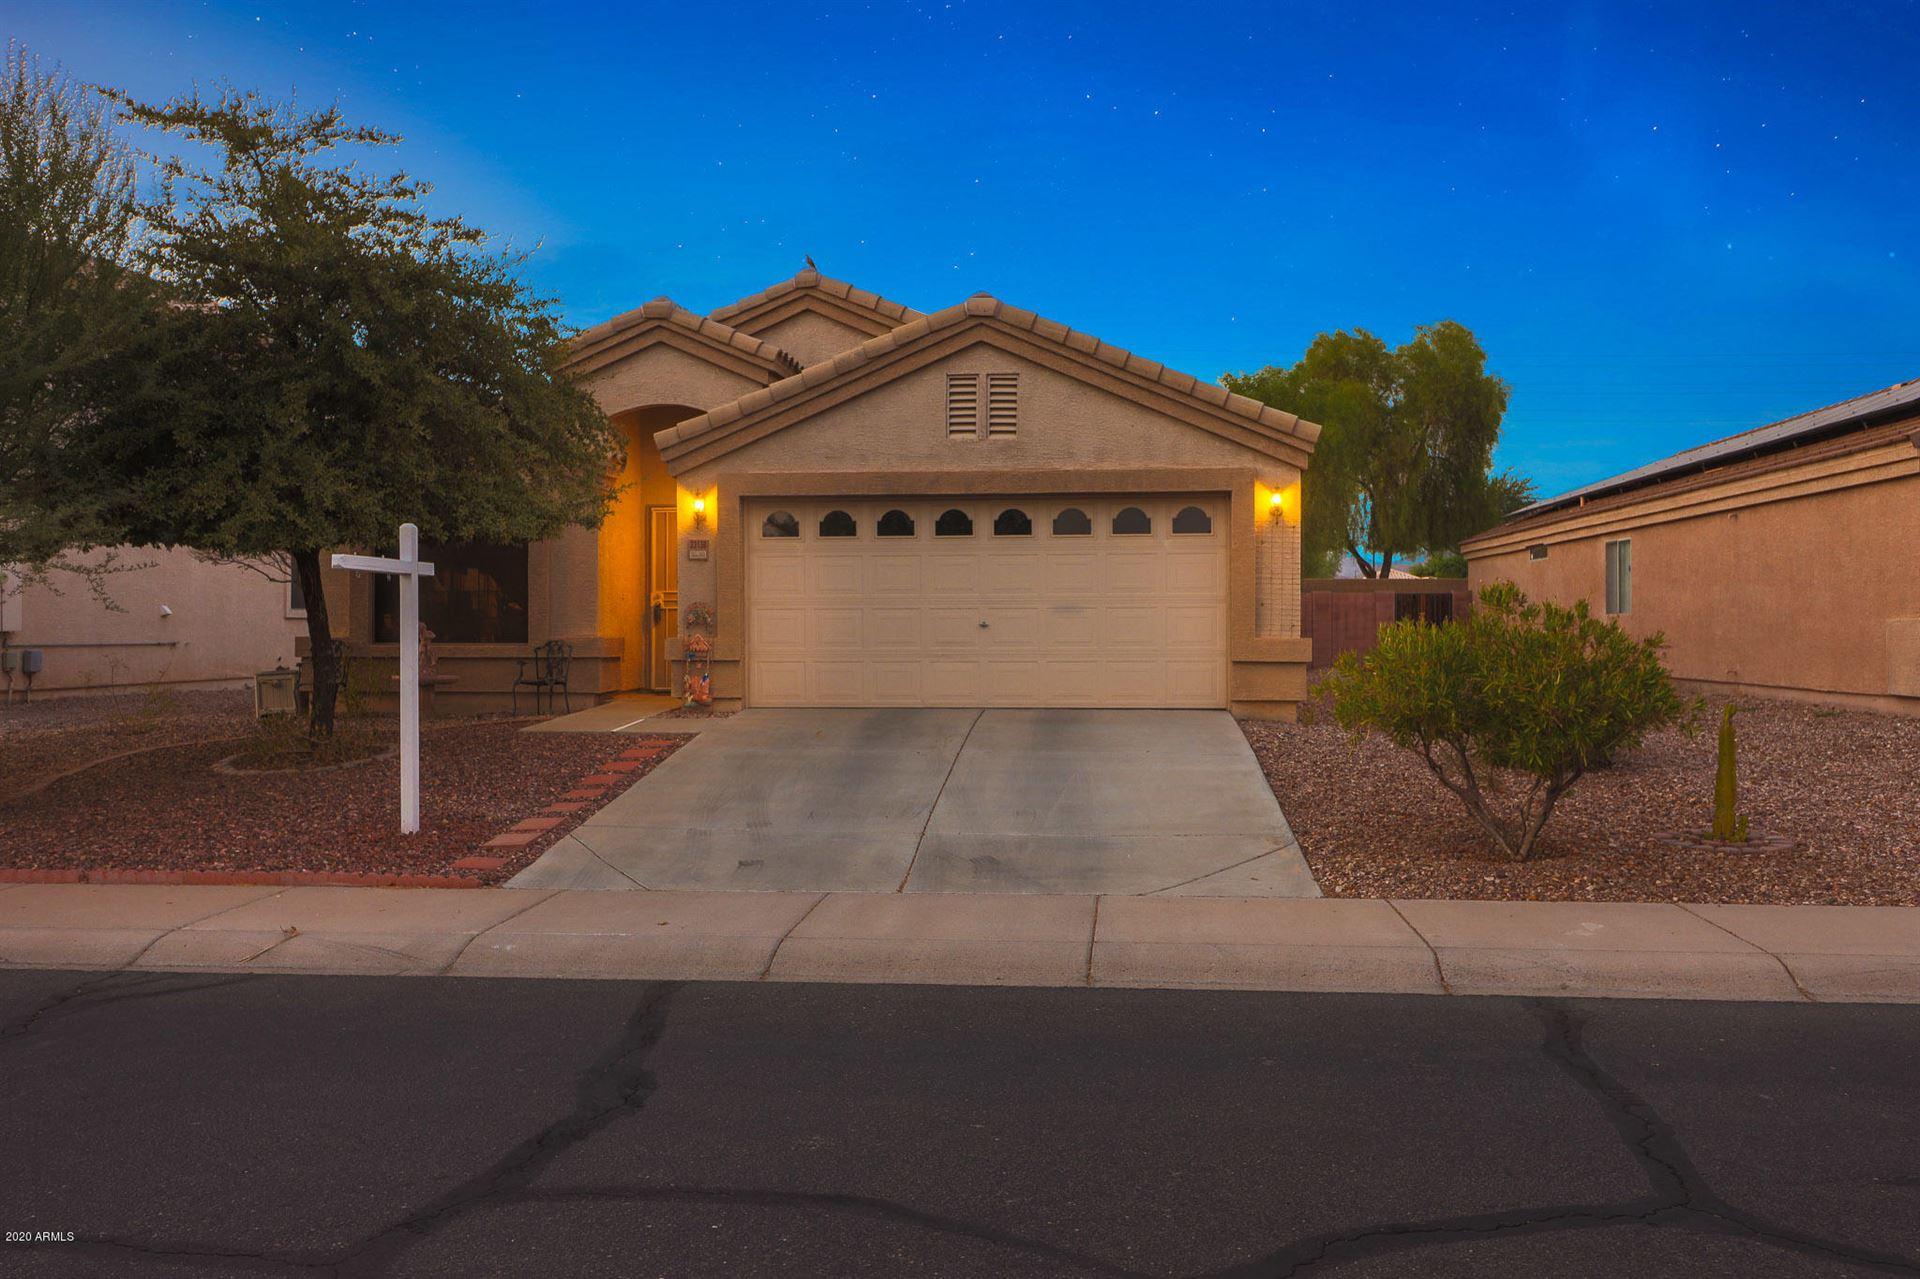 23138 W YAVAPAI Street, Buckeye, AZ 85326 - MLS#: 6123387